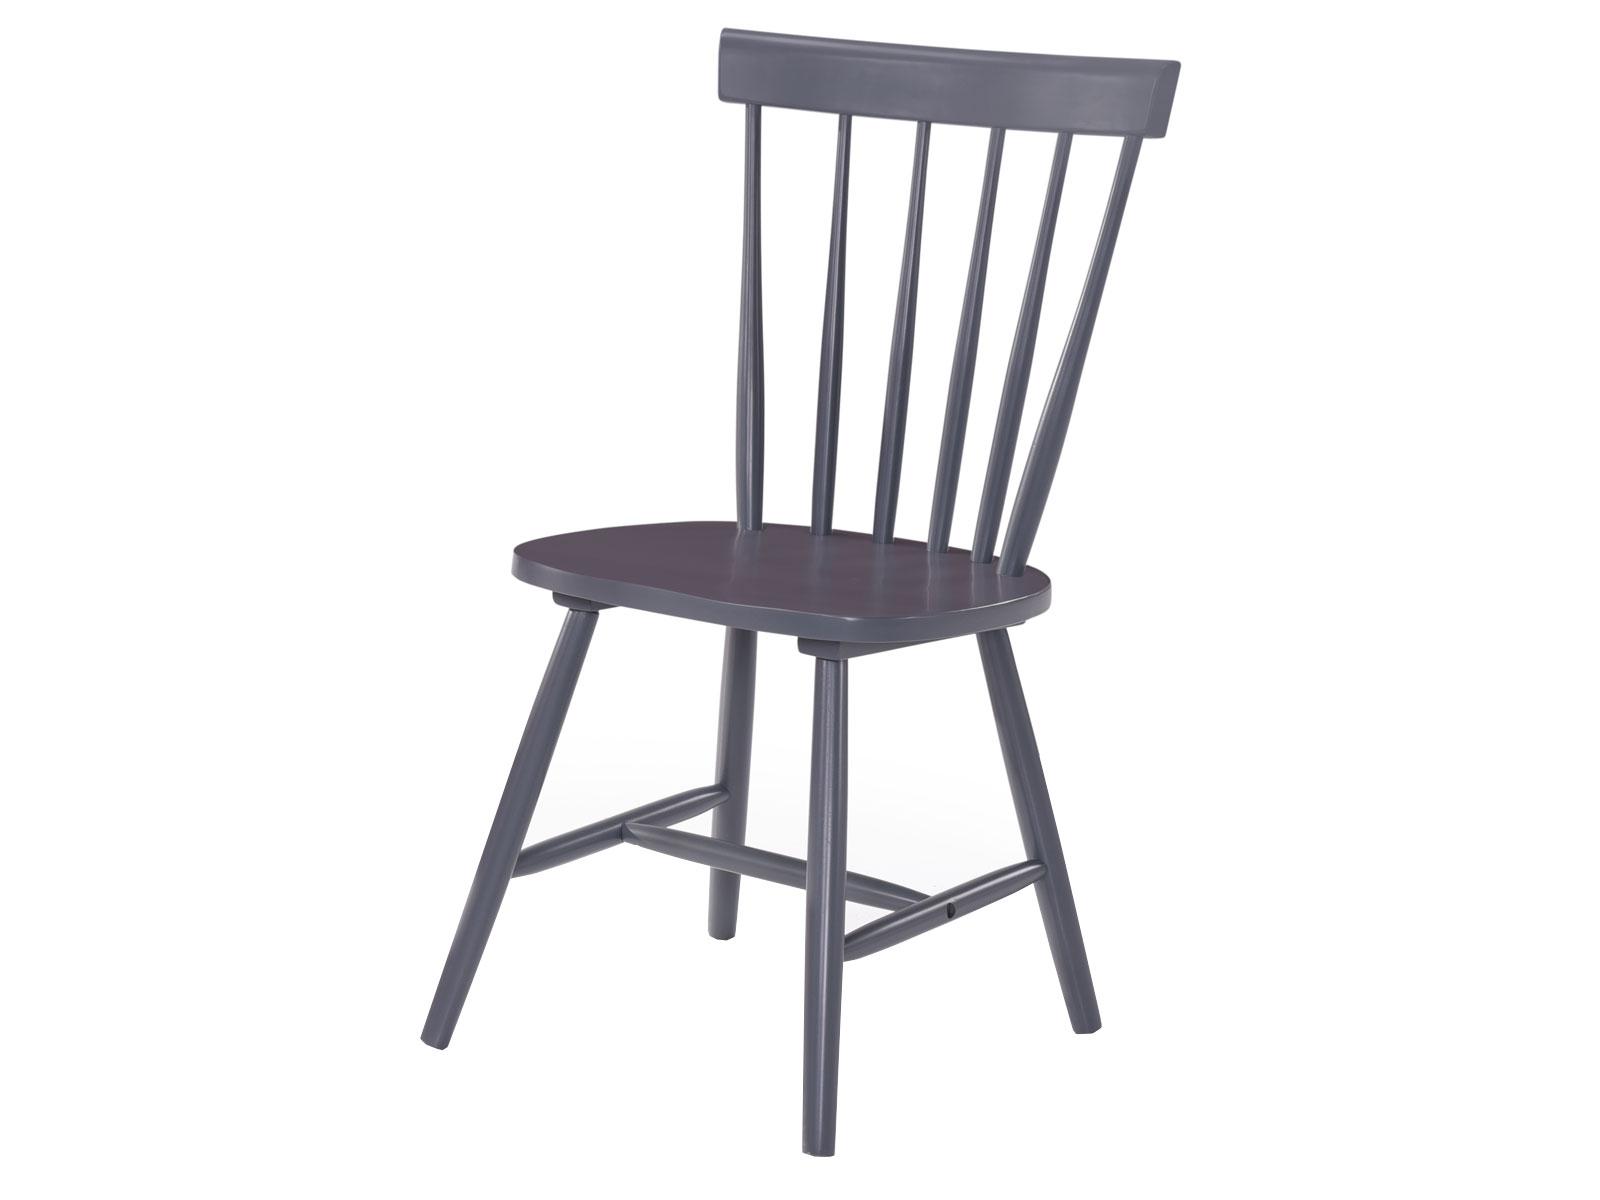 Scaun din lemn Guus Grey l44xA49xH885 cm